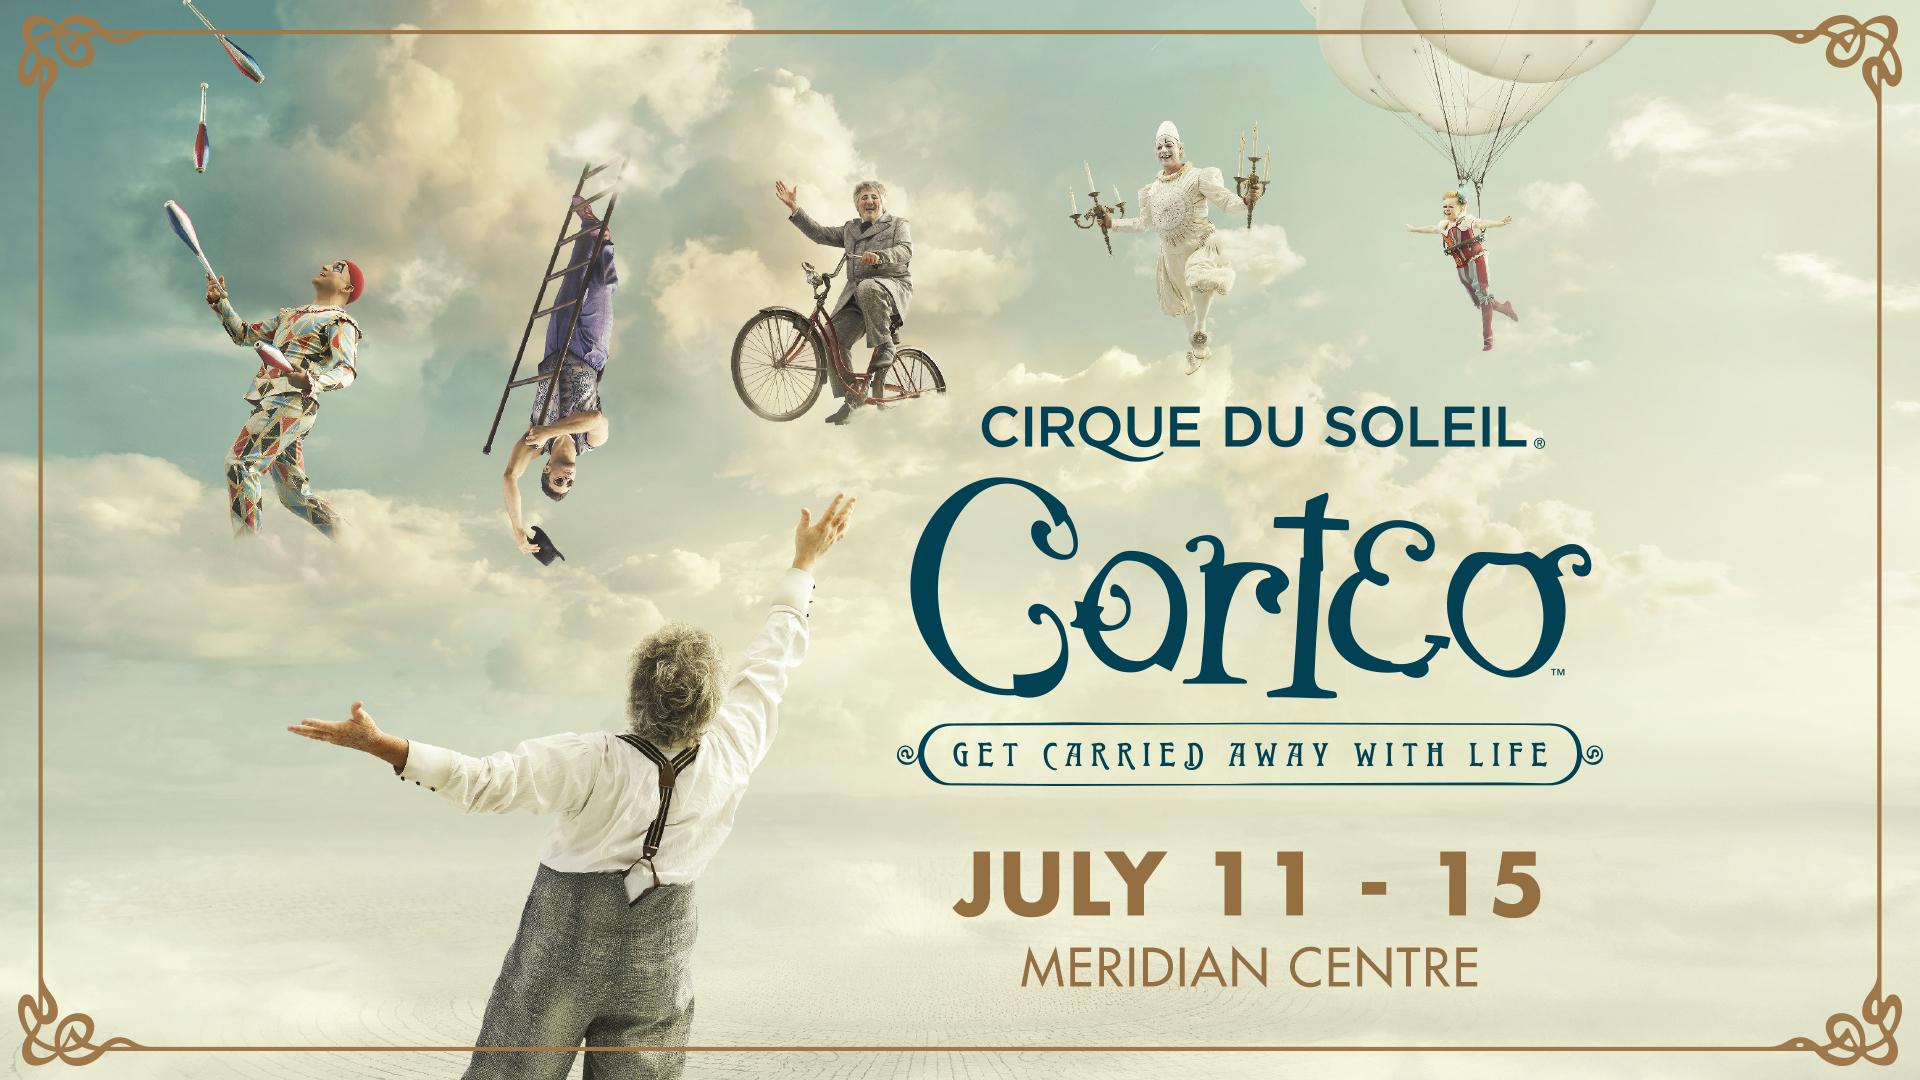 Summersault into Spring with Cirque du Soleil!